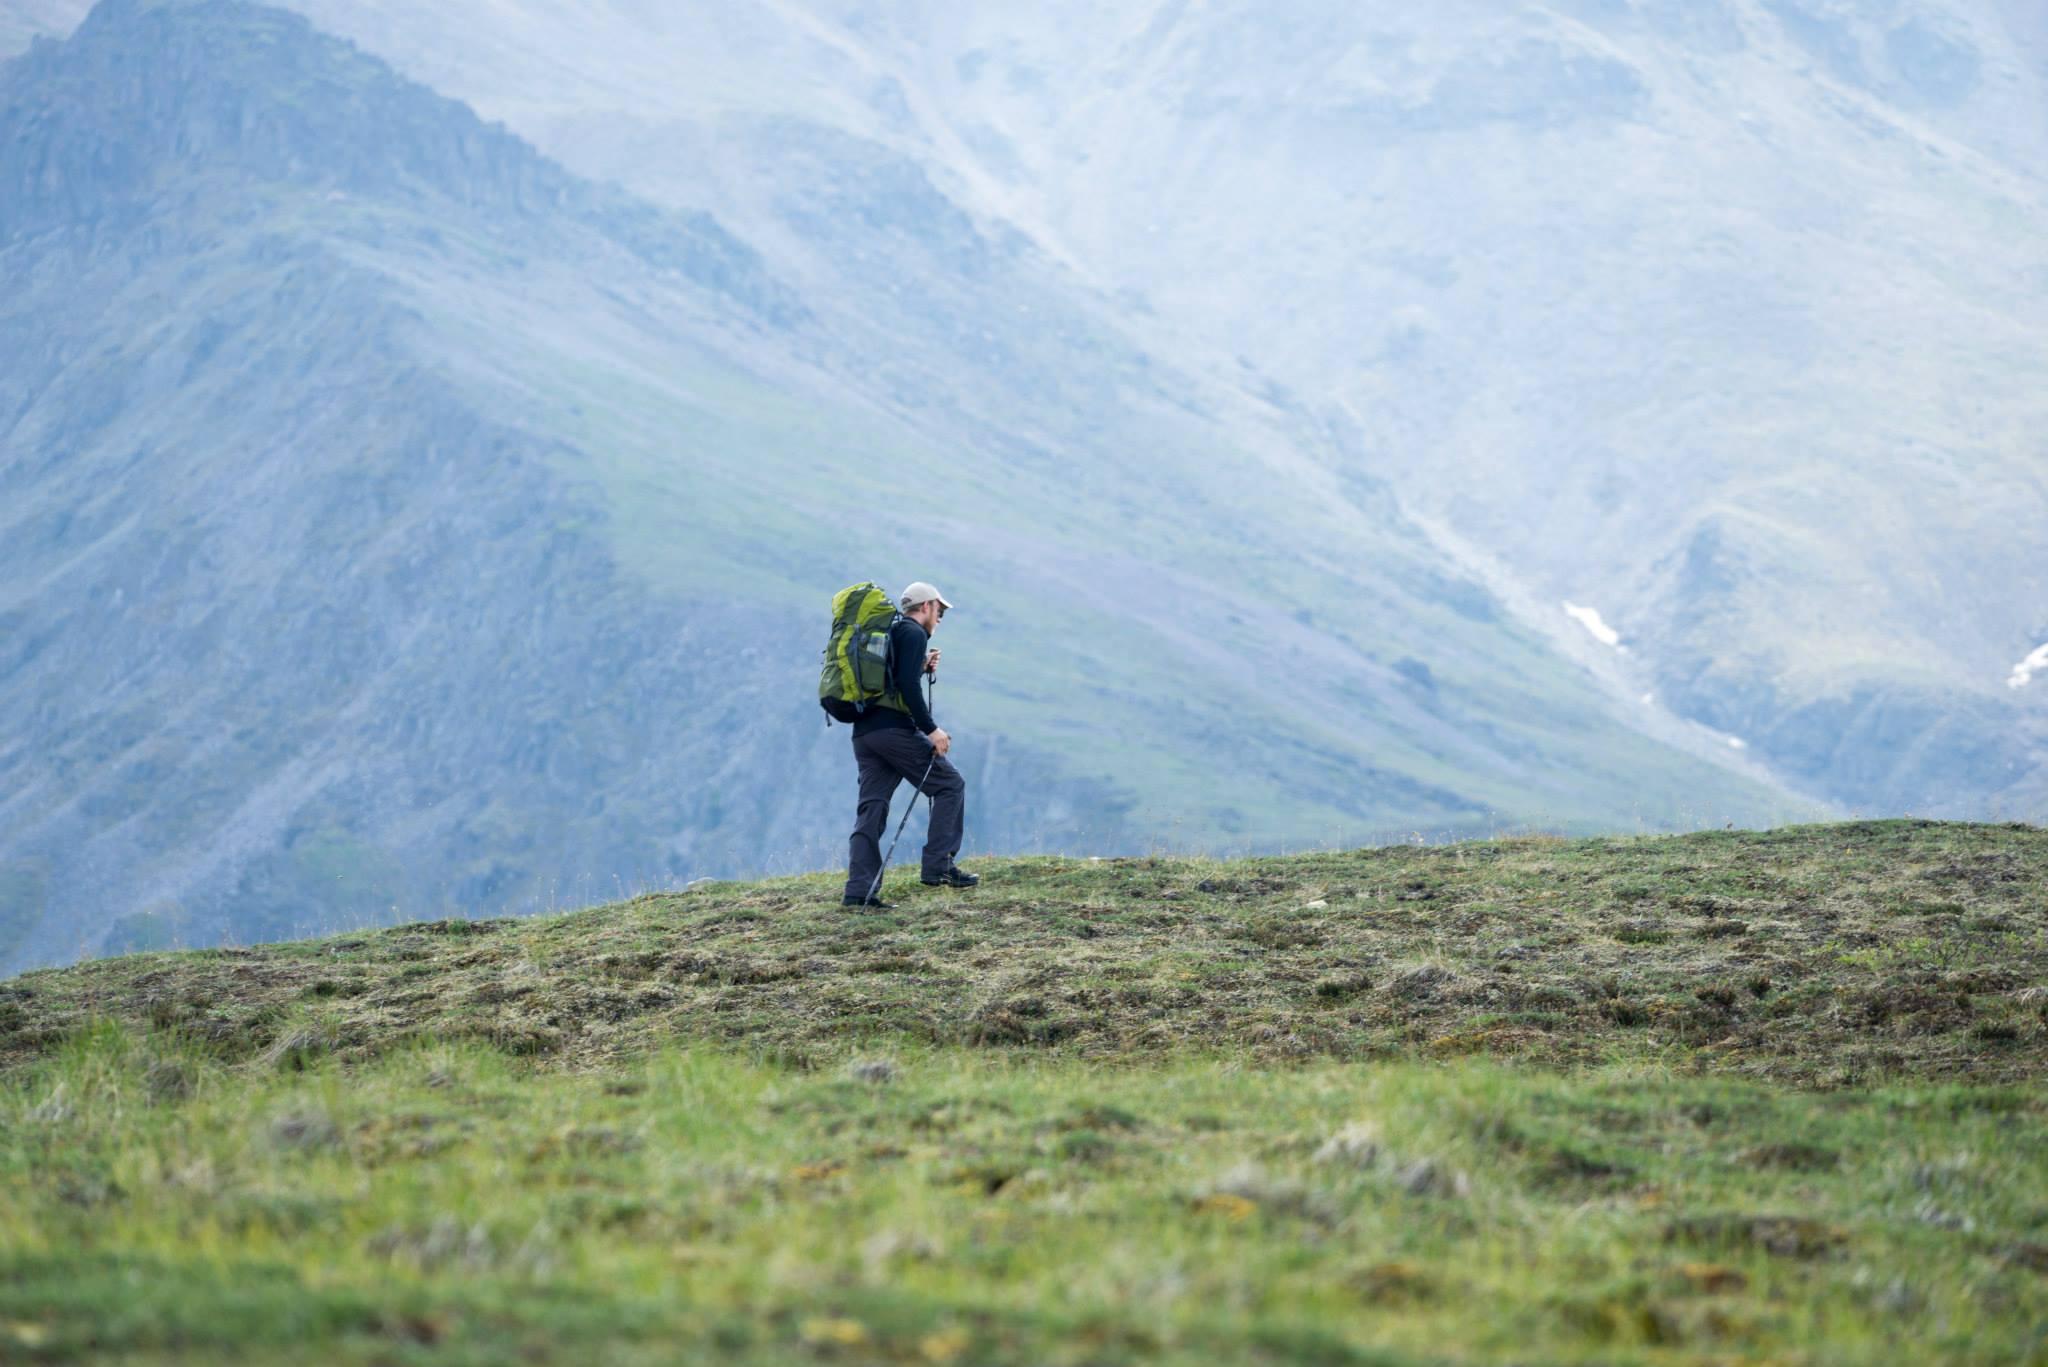 Climing Mt. Denali.jpg